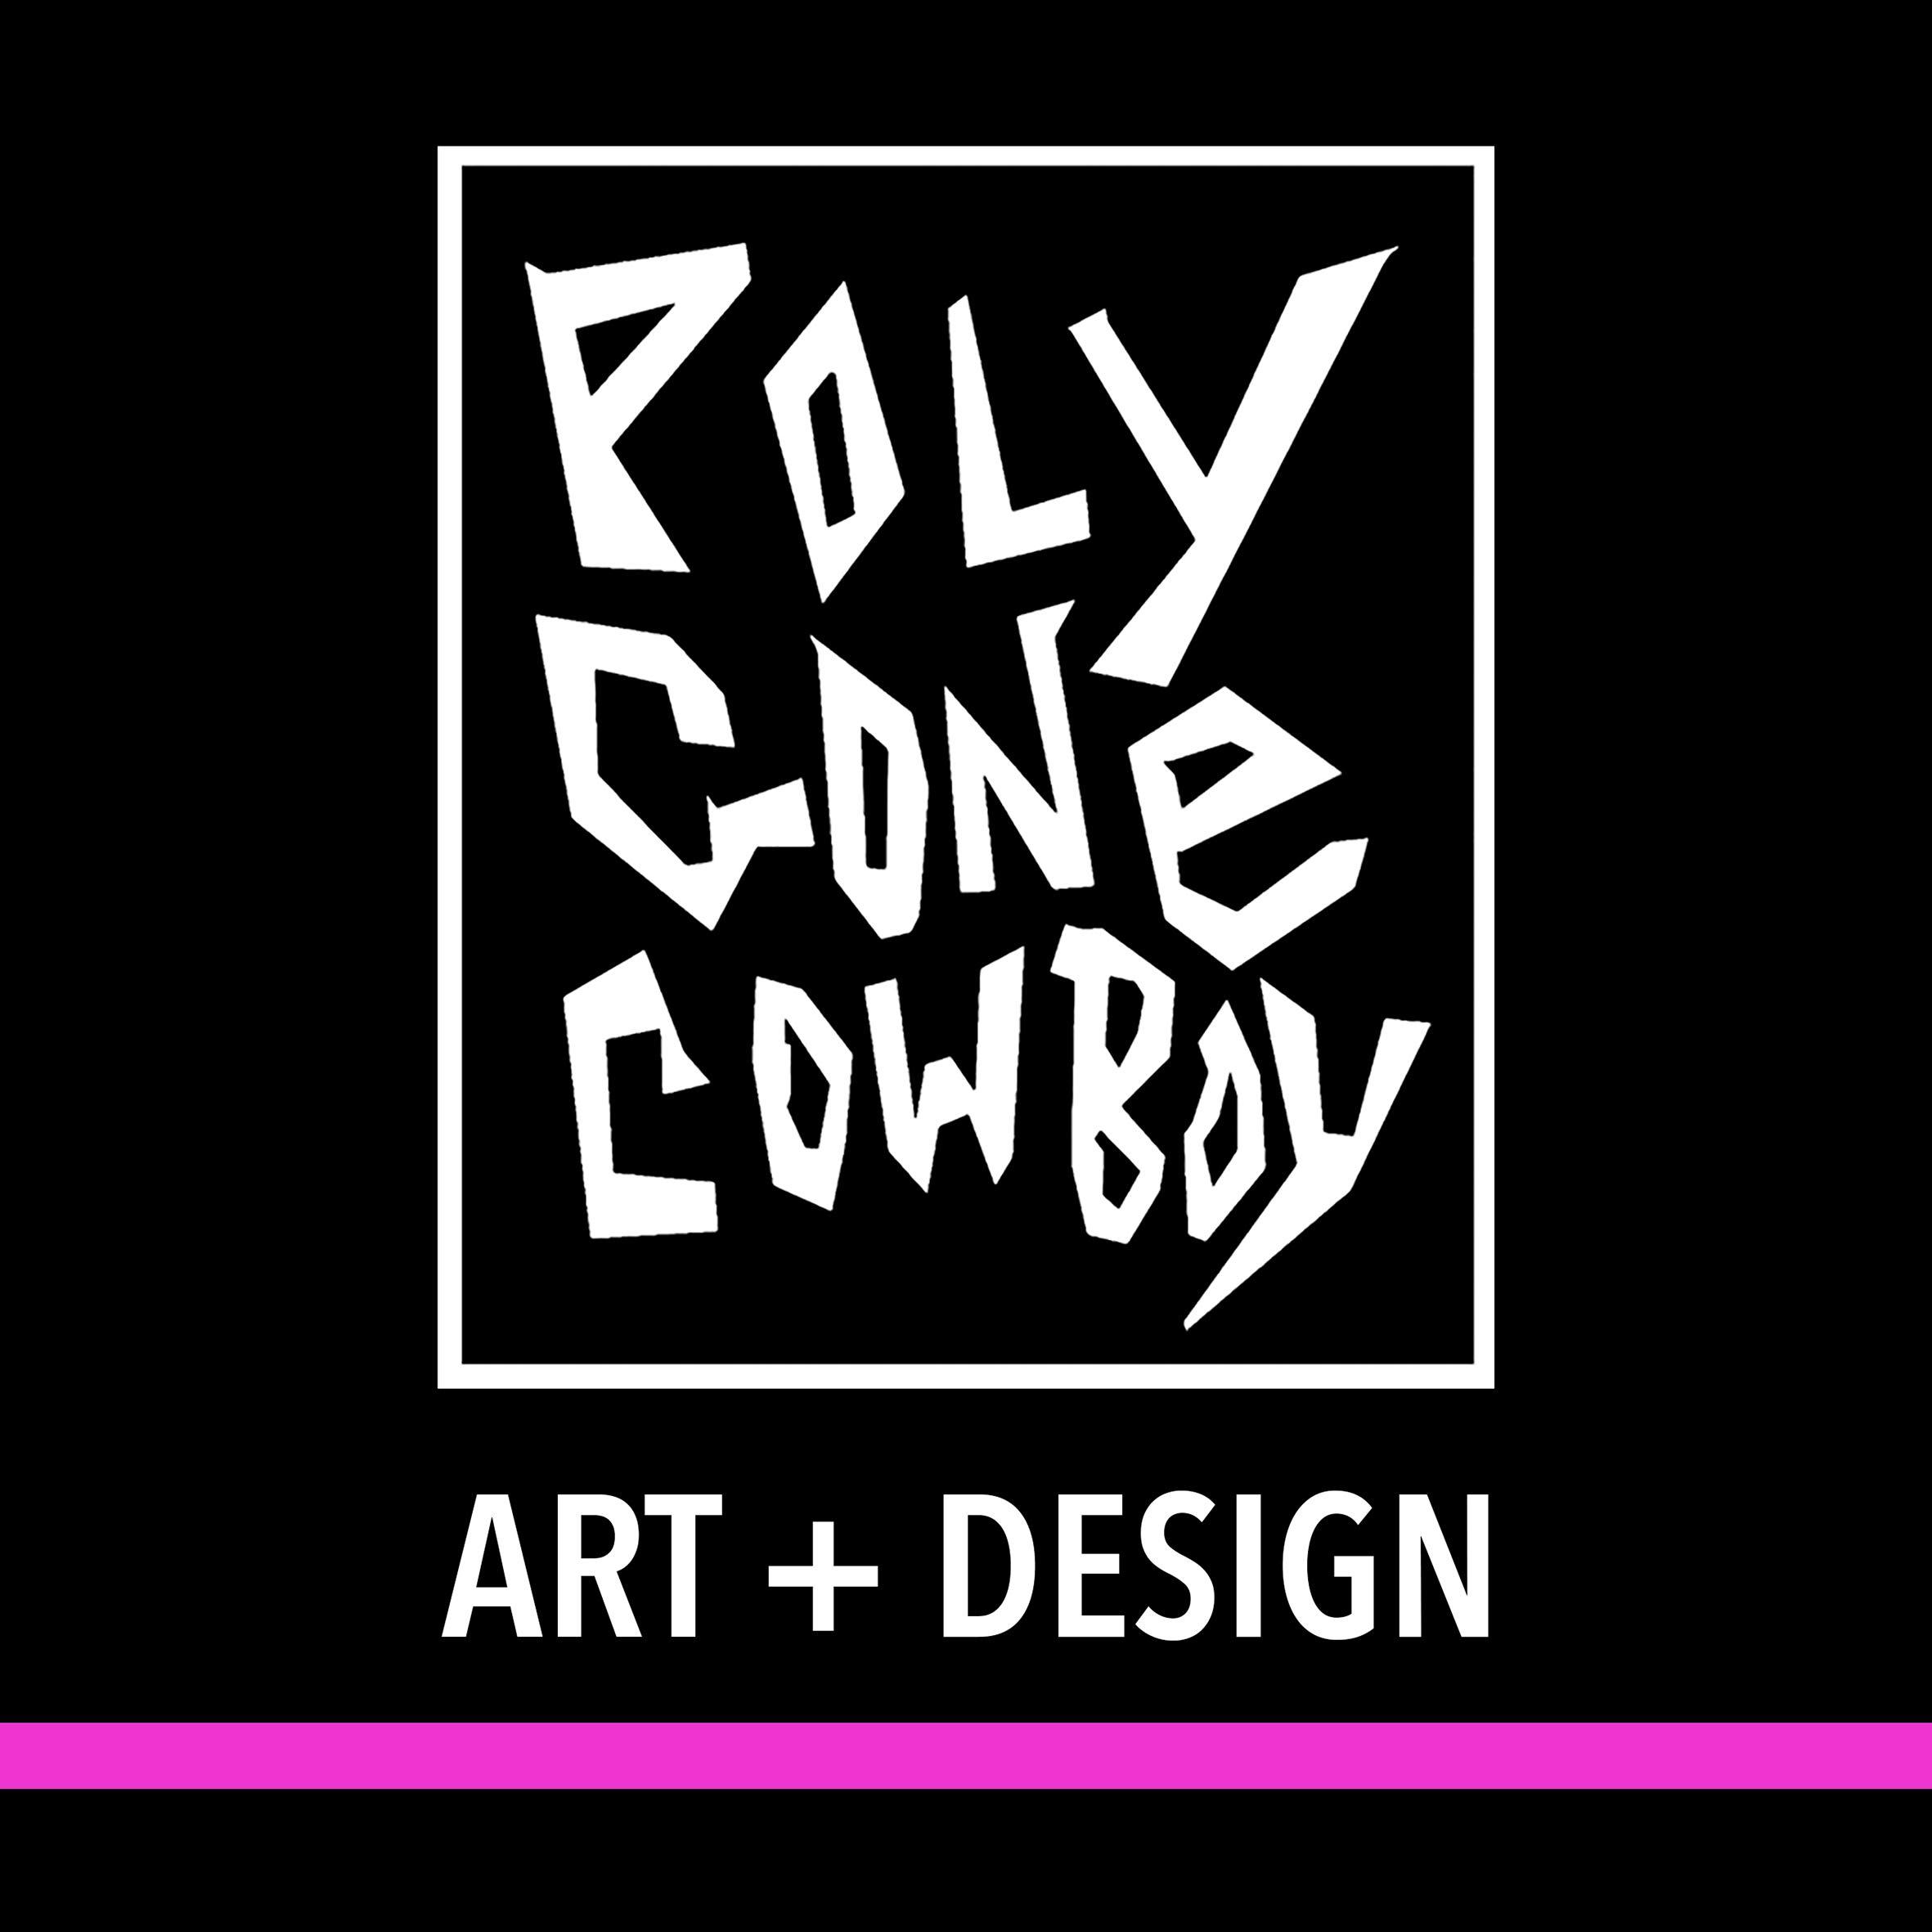 Poly Gone Cowboy